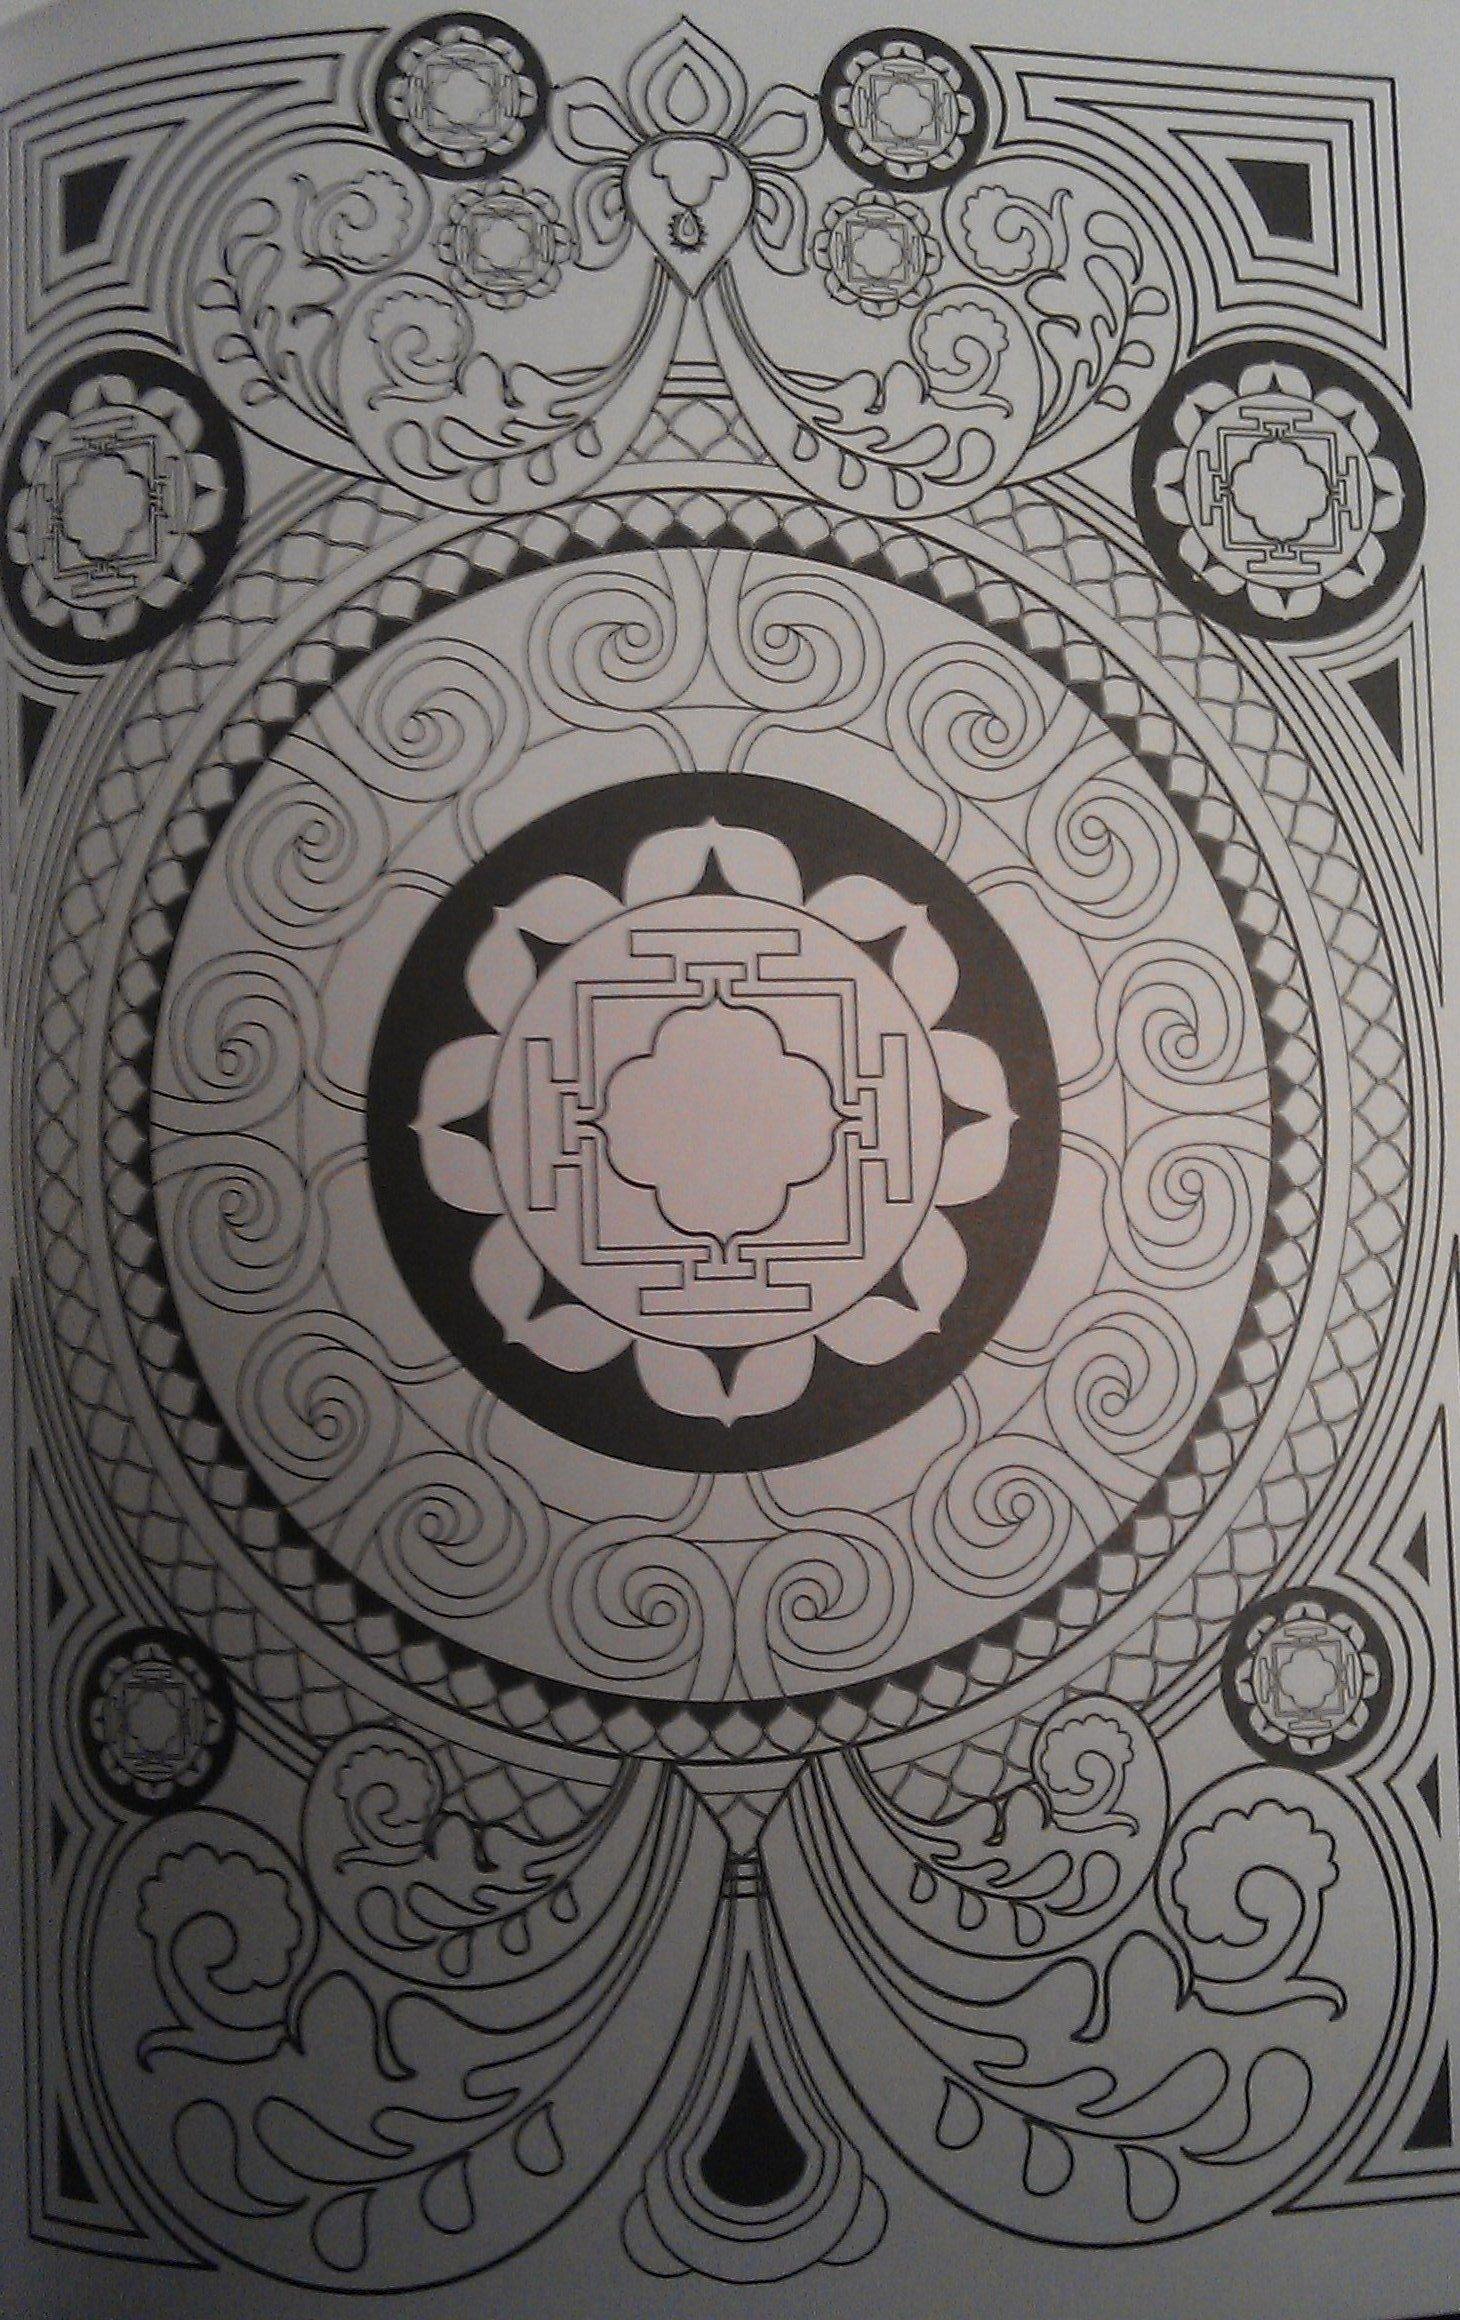 Coloriage Anti Stress Nature Et Decouverte.Decouverte 100 Mandalas Anti Stress Chez Maliluno